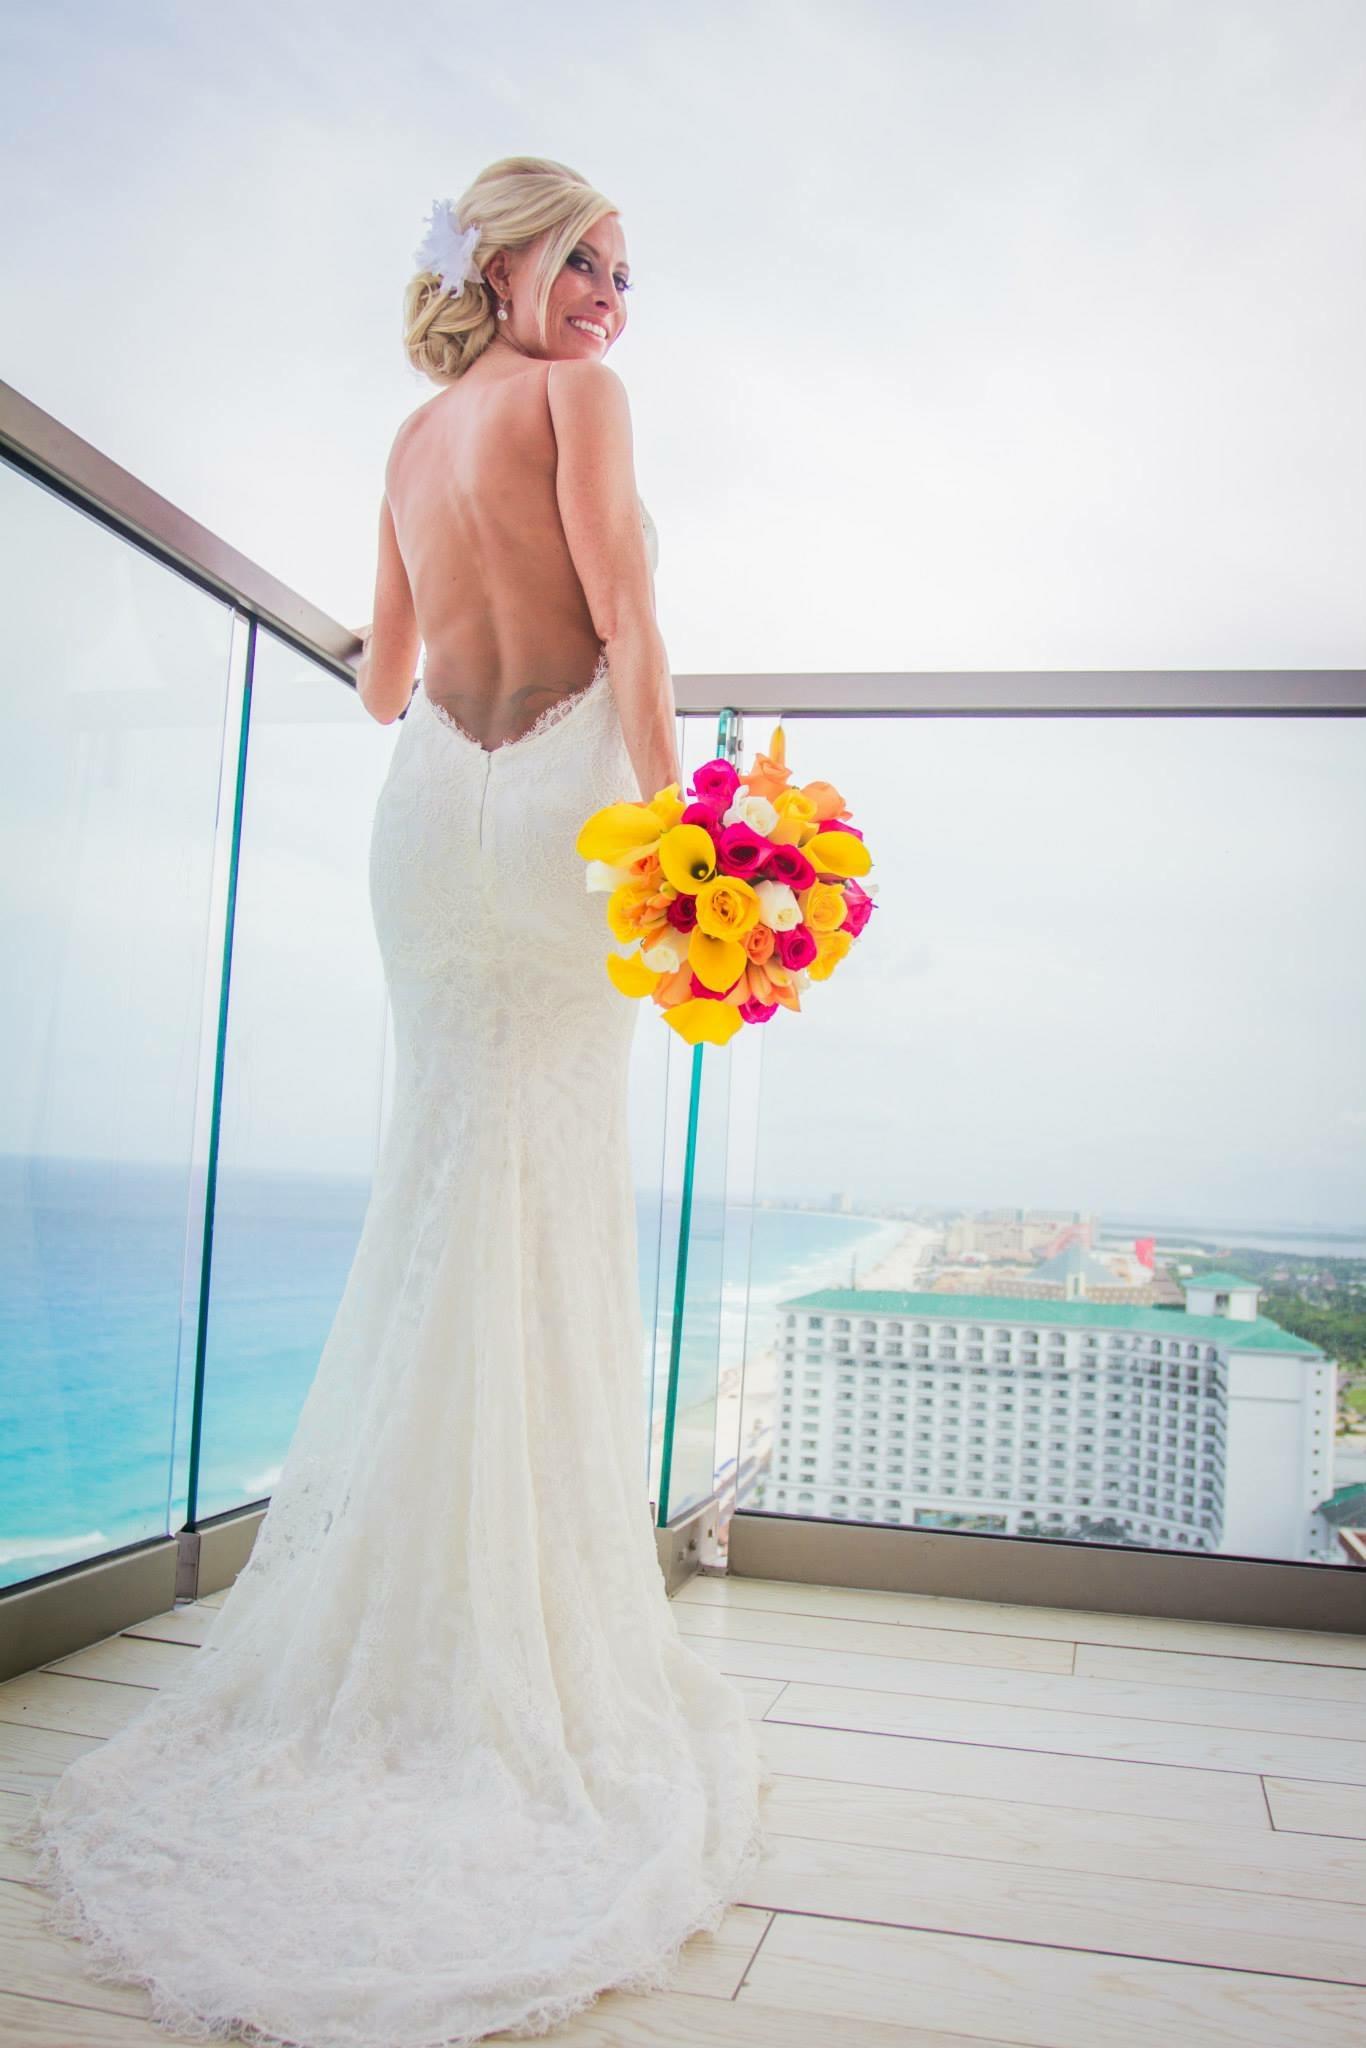 krysten-reed-cancun-beach-wedding-0.JPG